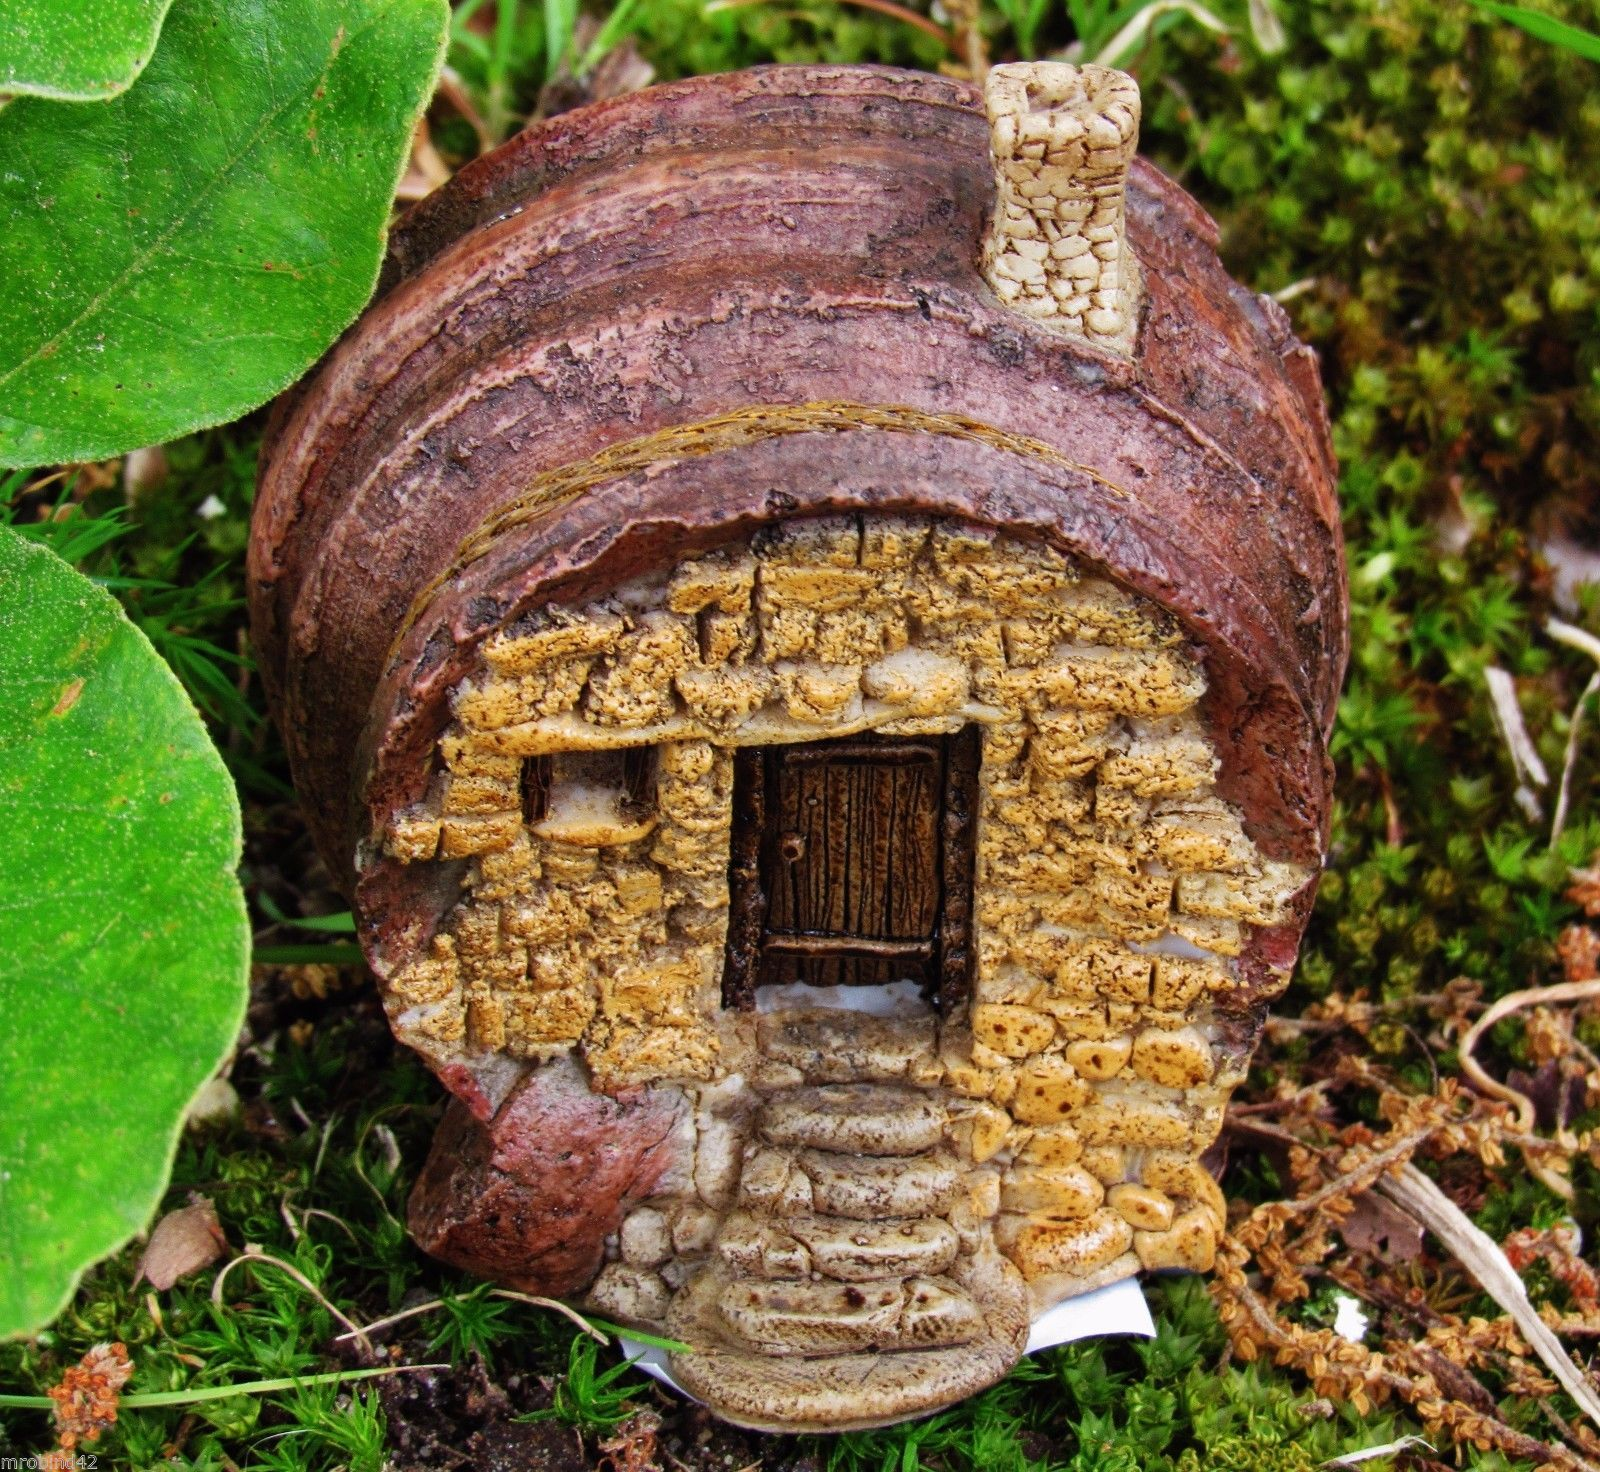 Wondrous Miniature Fairy Garden Micro Mini Fairy Gnome Snail Shell House Miniature Fairy Garden Micro Mini Fairy Gnome Snail Shell House Micro Mini Fairy Garden Accessories Micro Miniature Fairy Garde